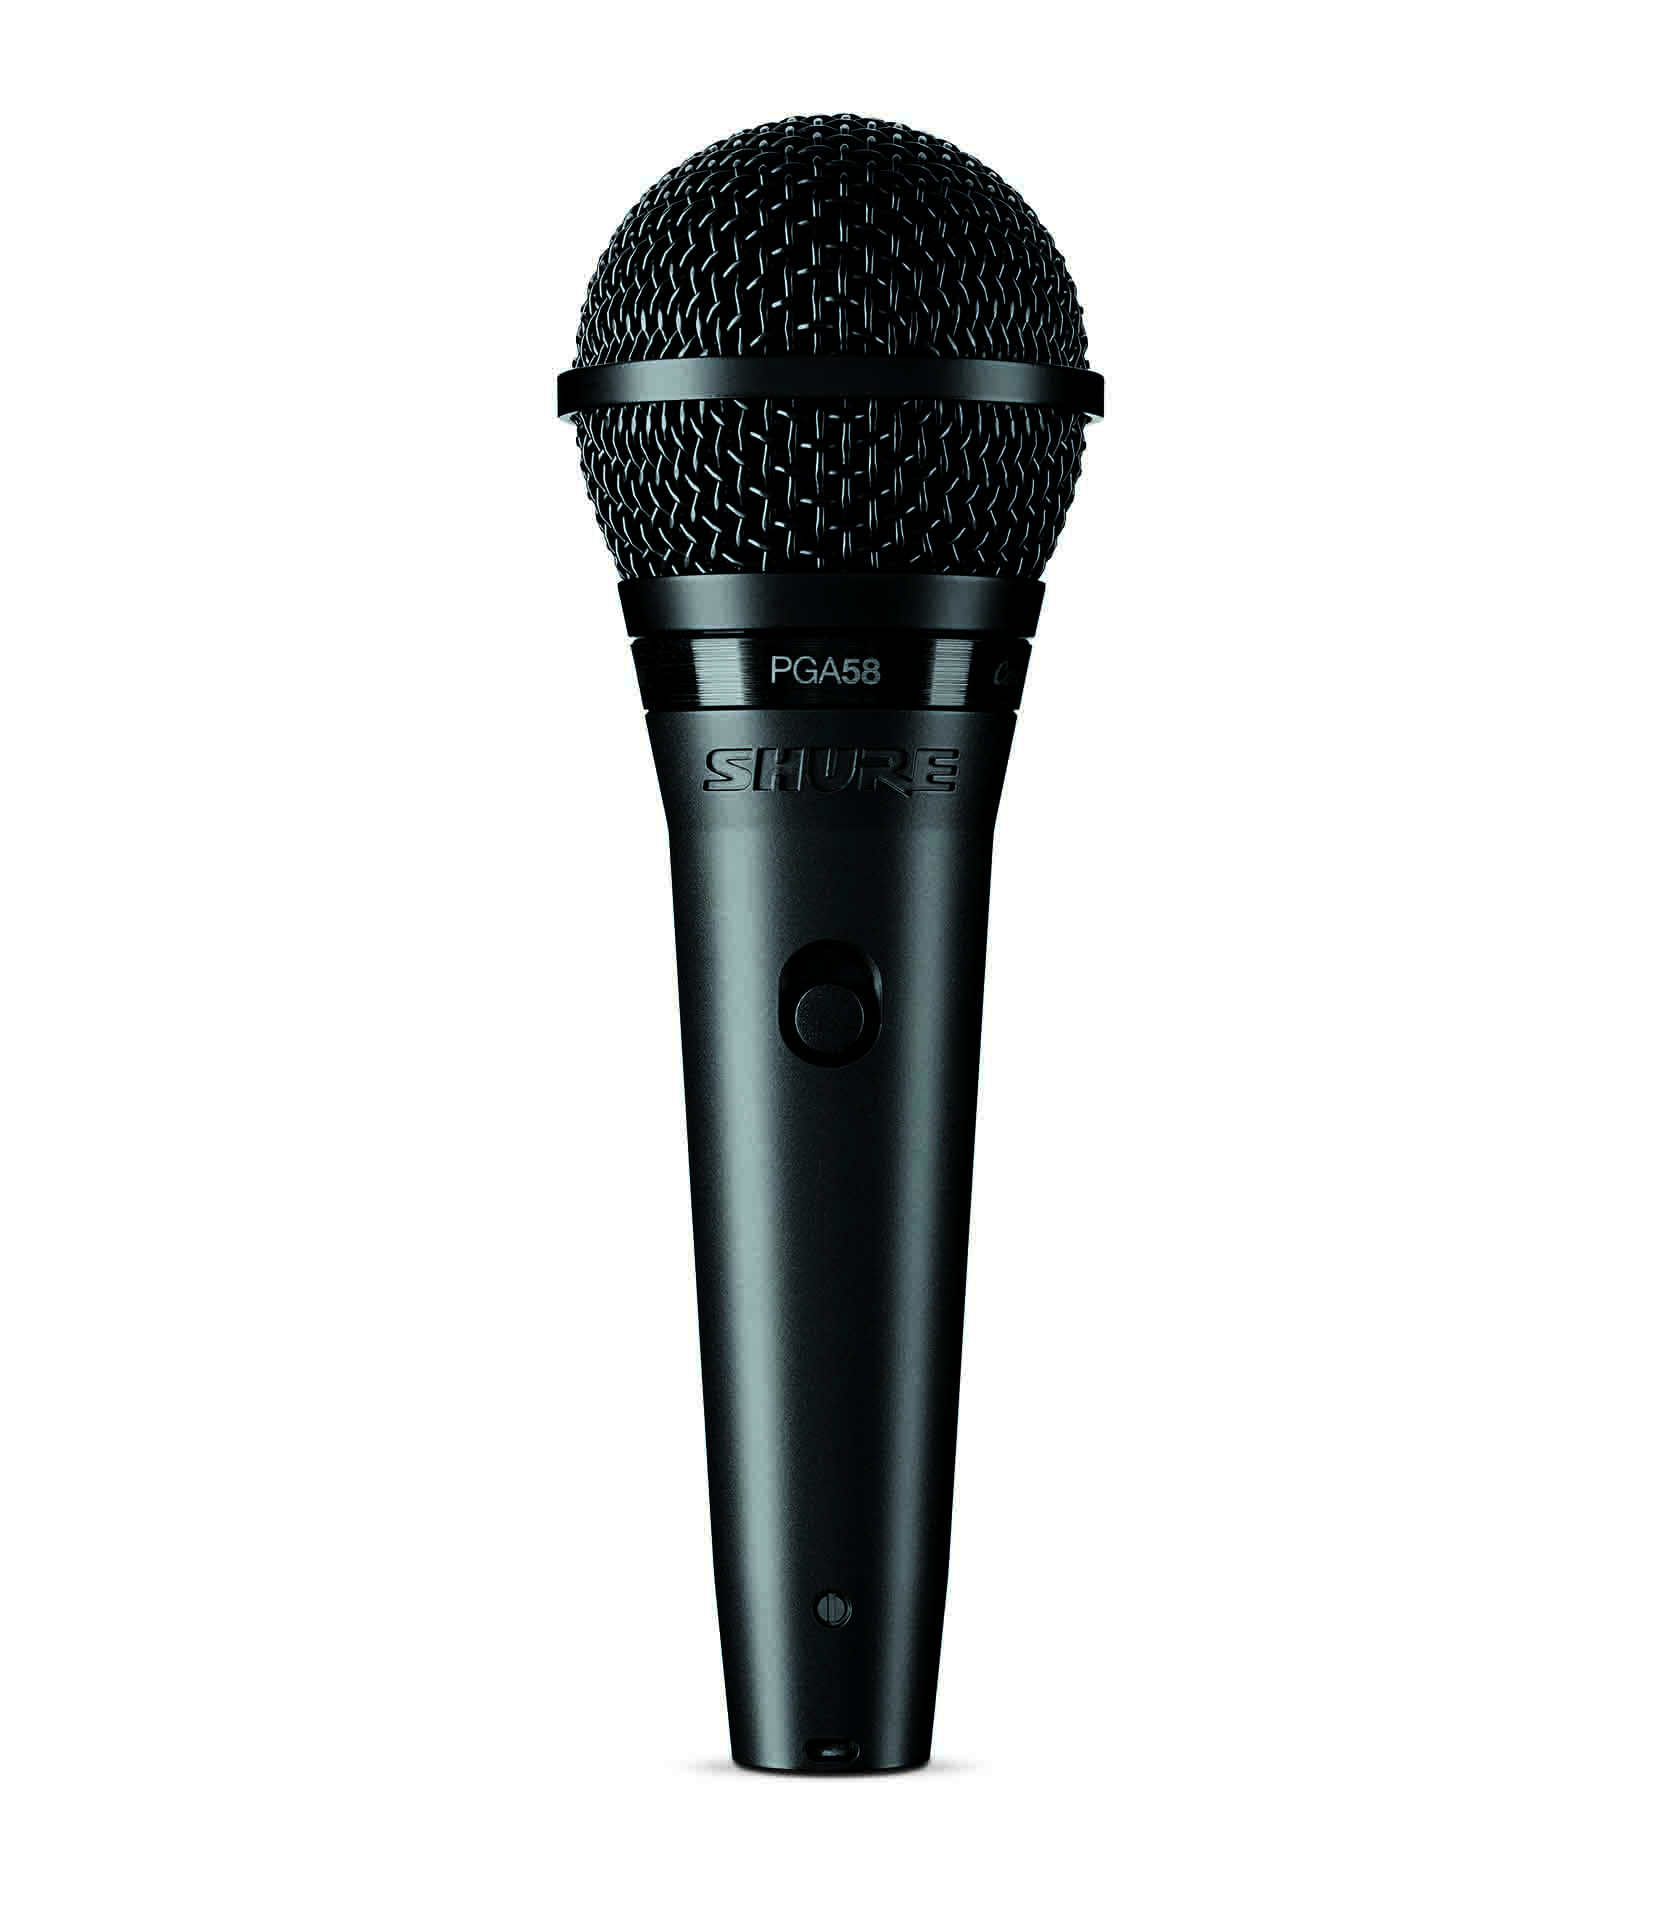 PGA58 XLR E Cardioid Dynamic Microphone